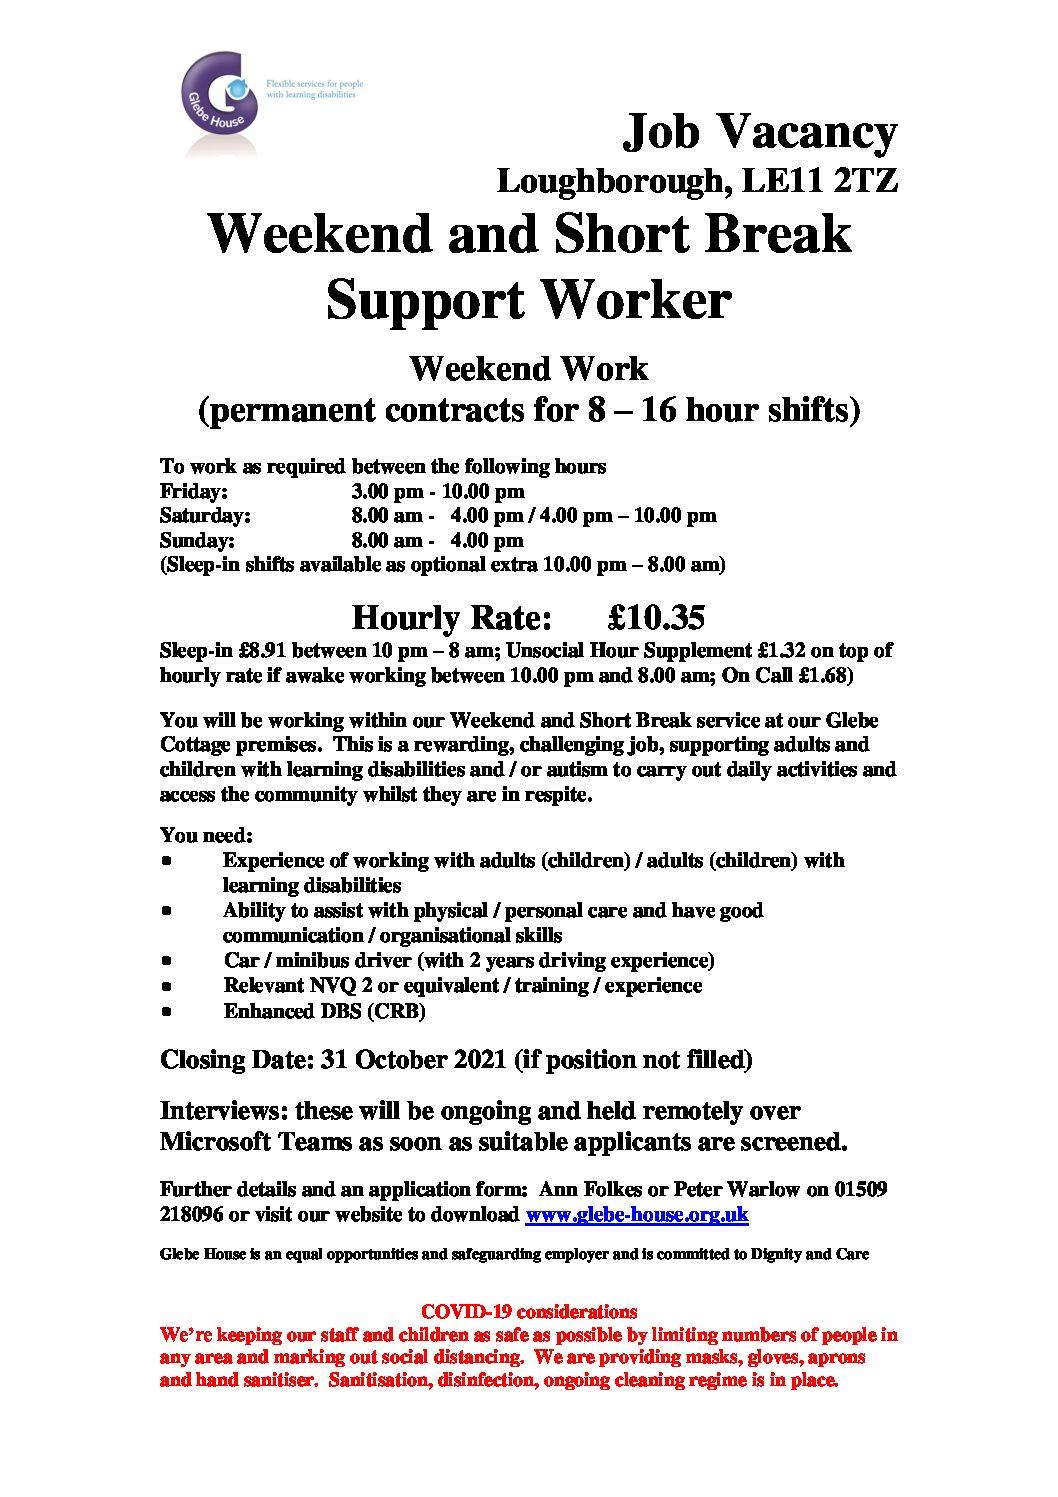 Weekend and Short Break Support Worker